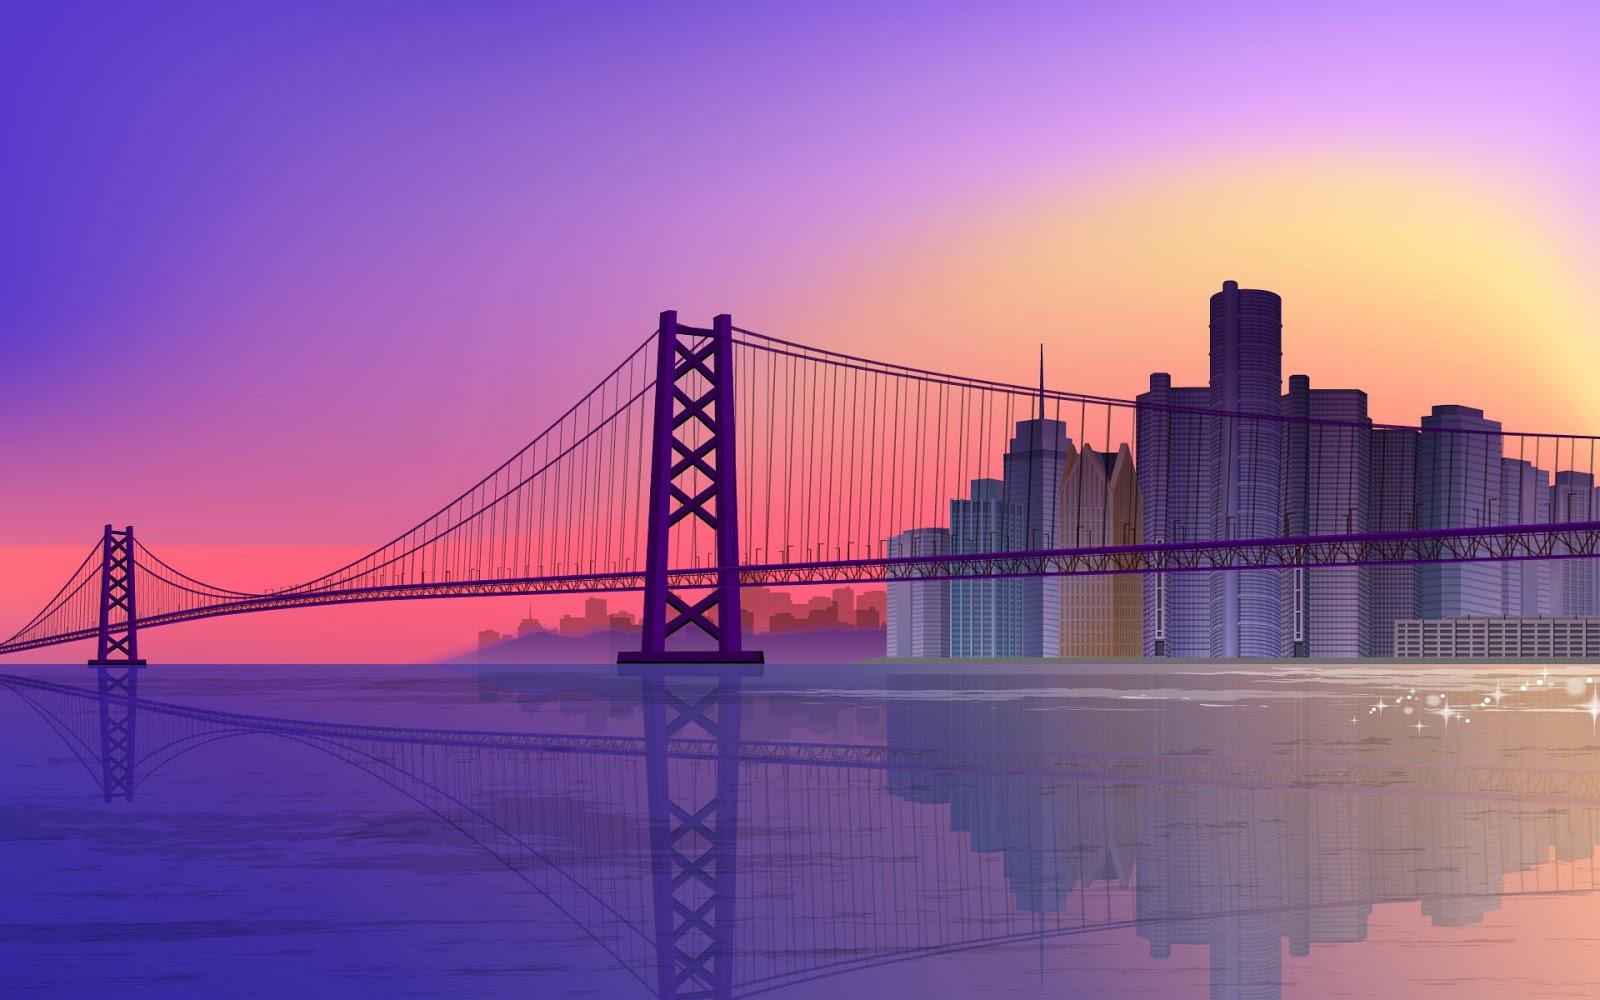 bridges bridges architecture